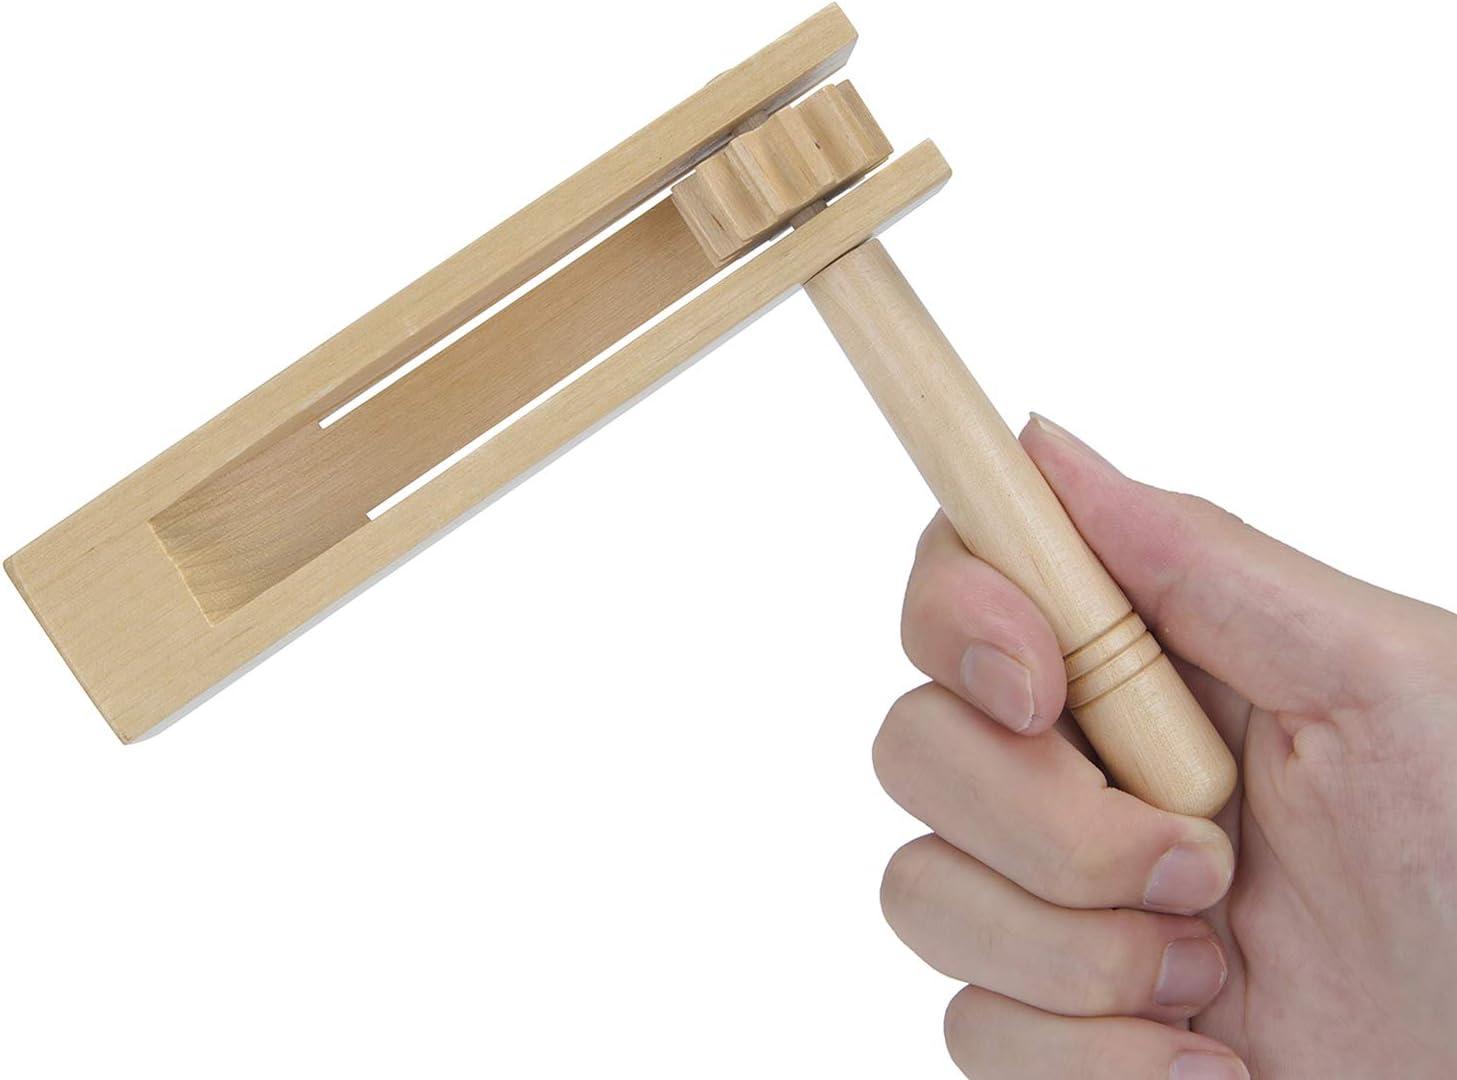 Madera Spinning Rattle Ratchet Ruido Maker Tradicional Matraca ...